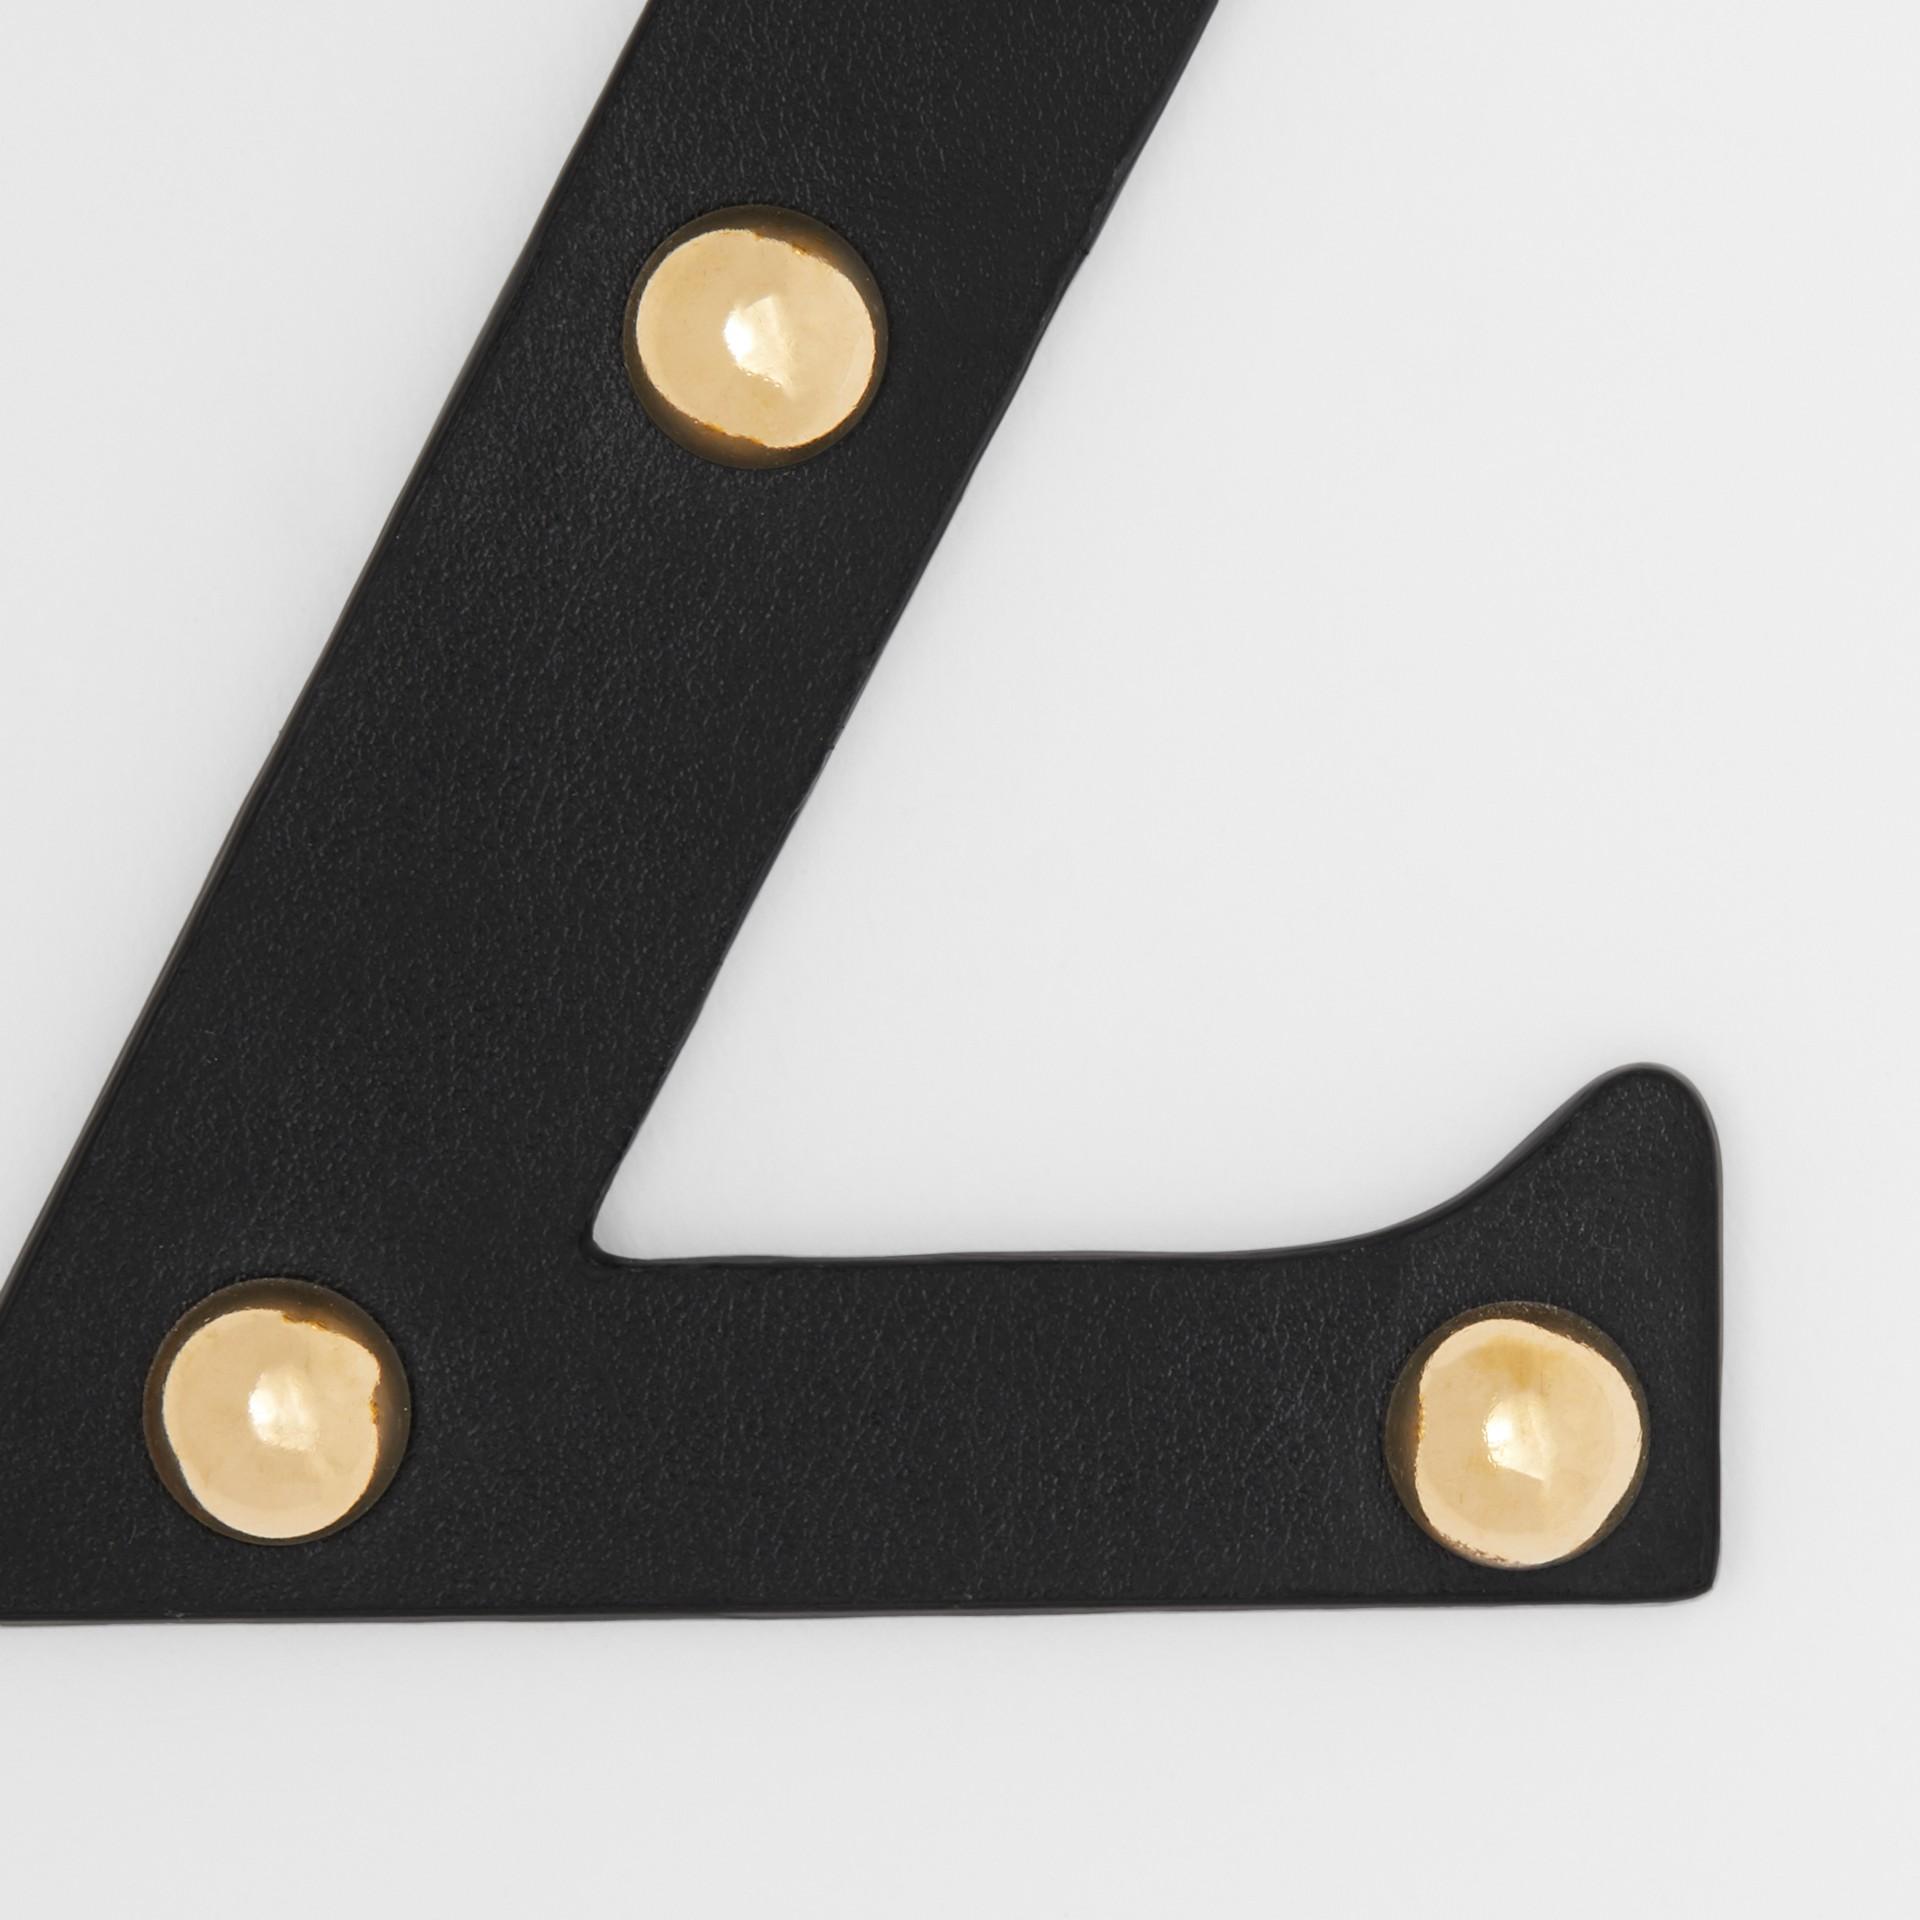 'Z' Studded Leather Alphabet Charm in Black/light Gold - Women | Burberry United Kingdom - gallery image 1